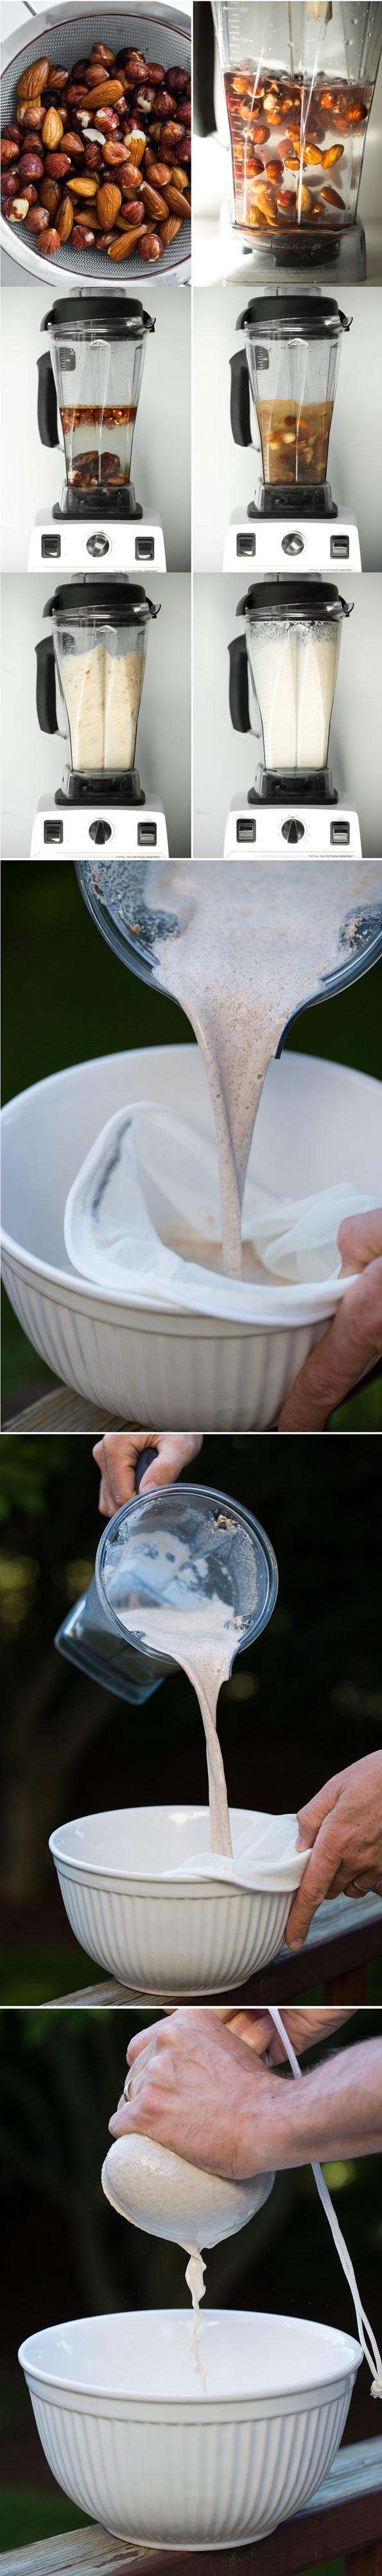 homemadehazelnutmilk